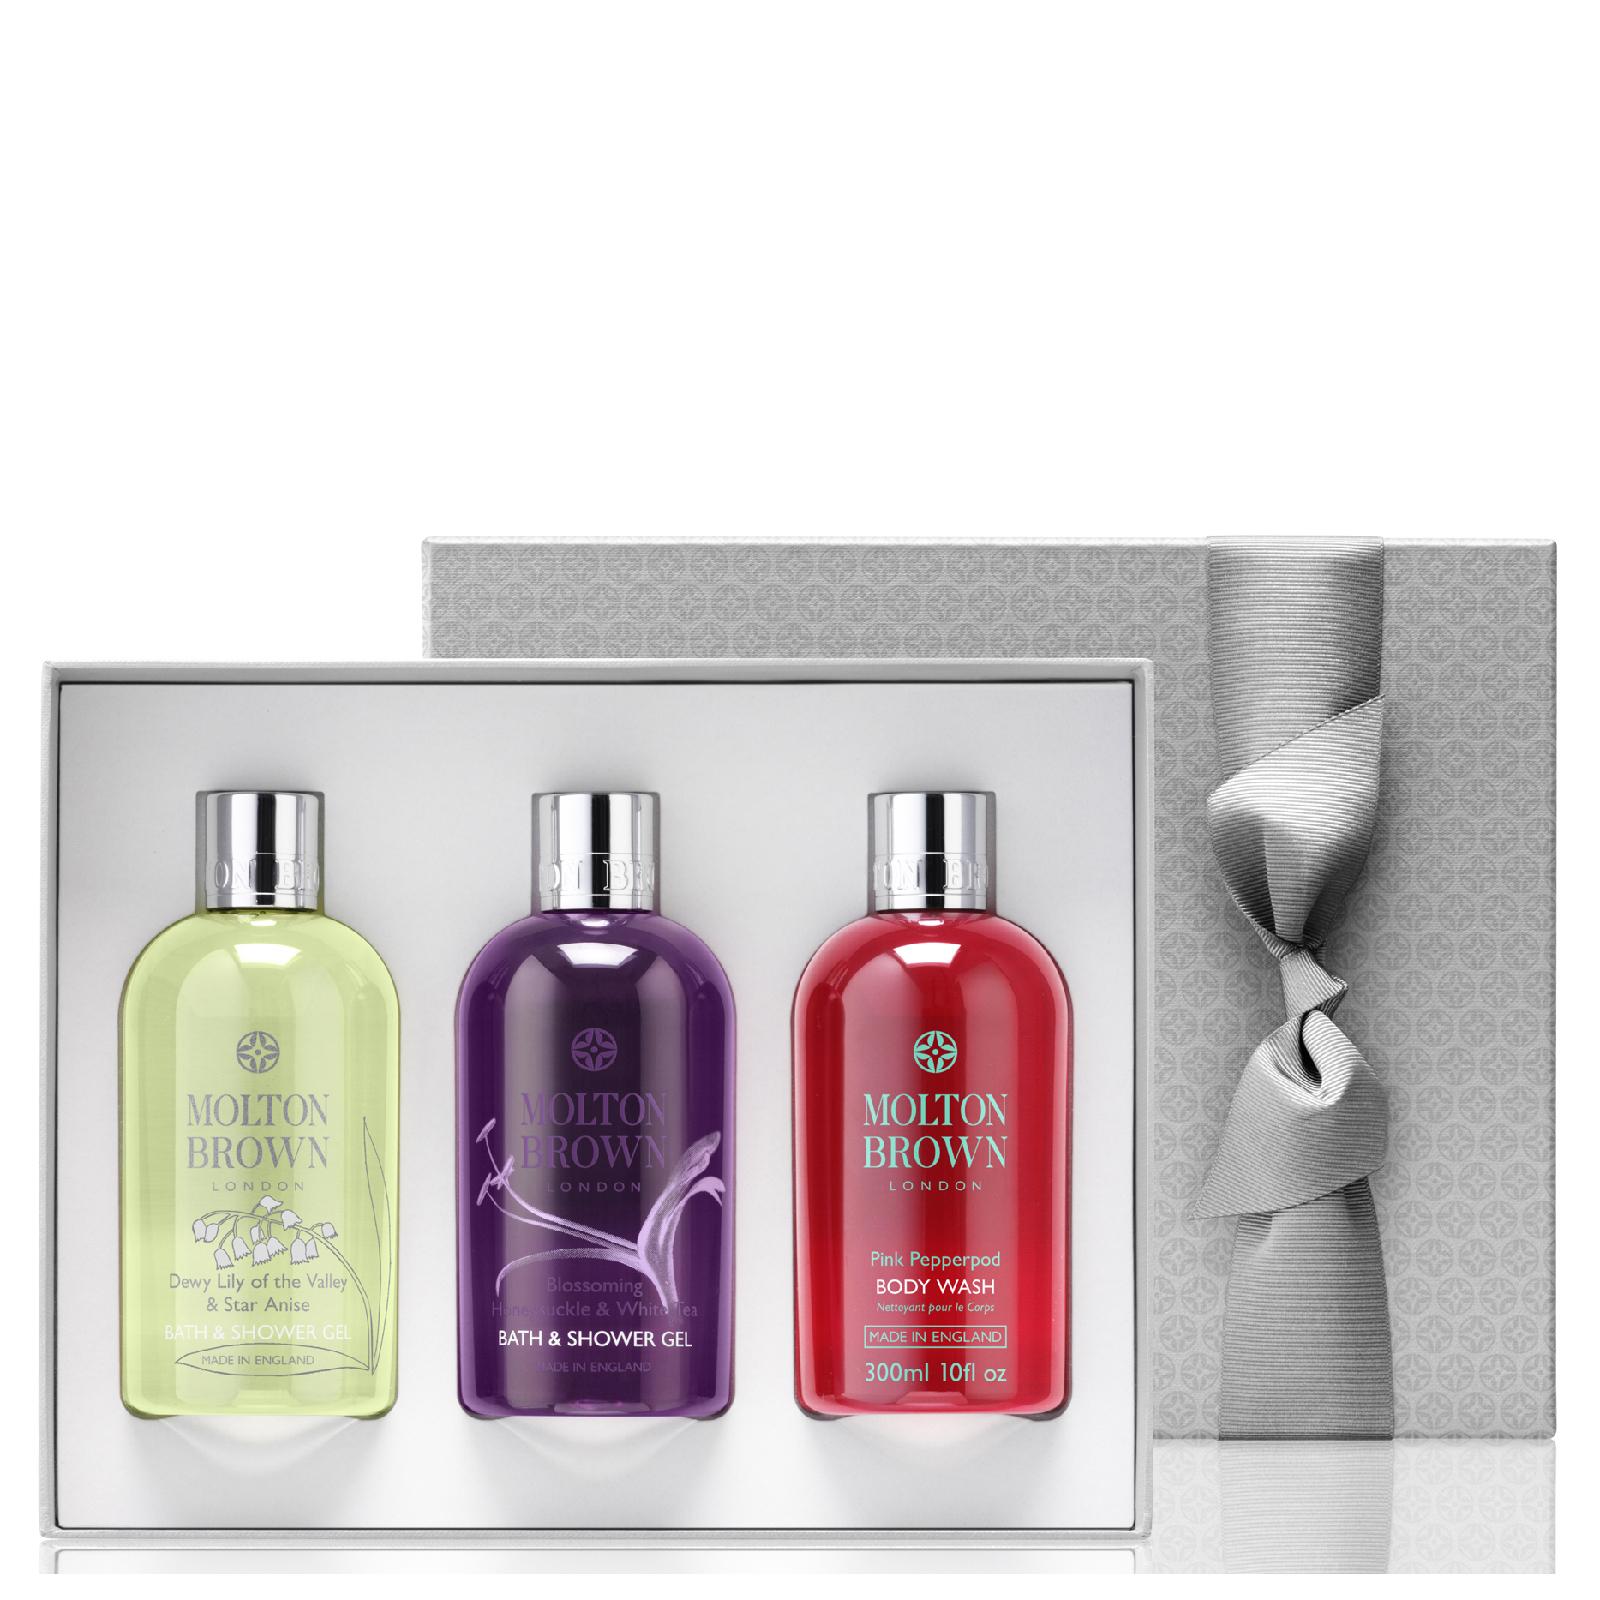 Molton Brown Bathing Indulgences Gift Set For Her (Worth $66). Description